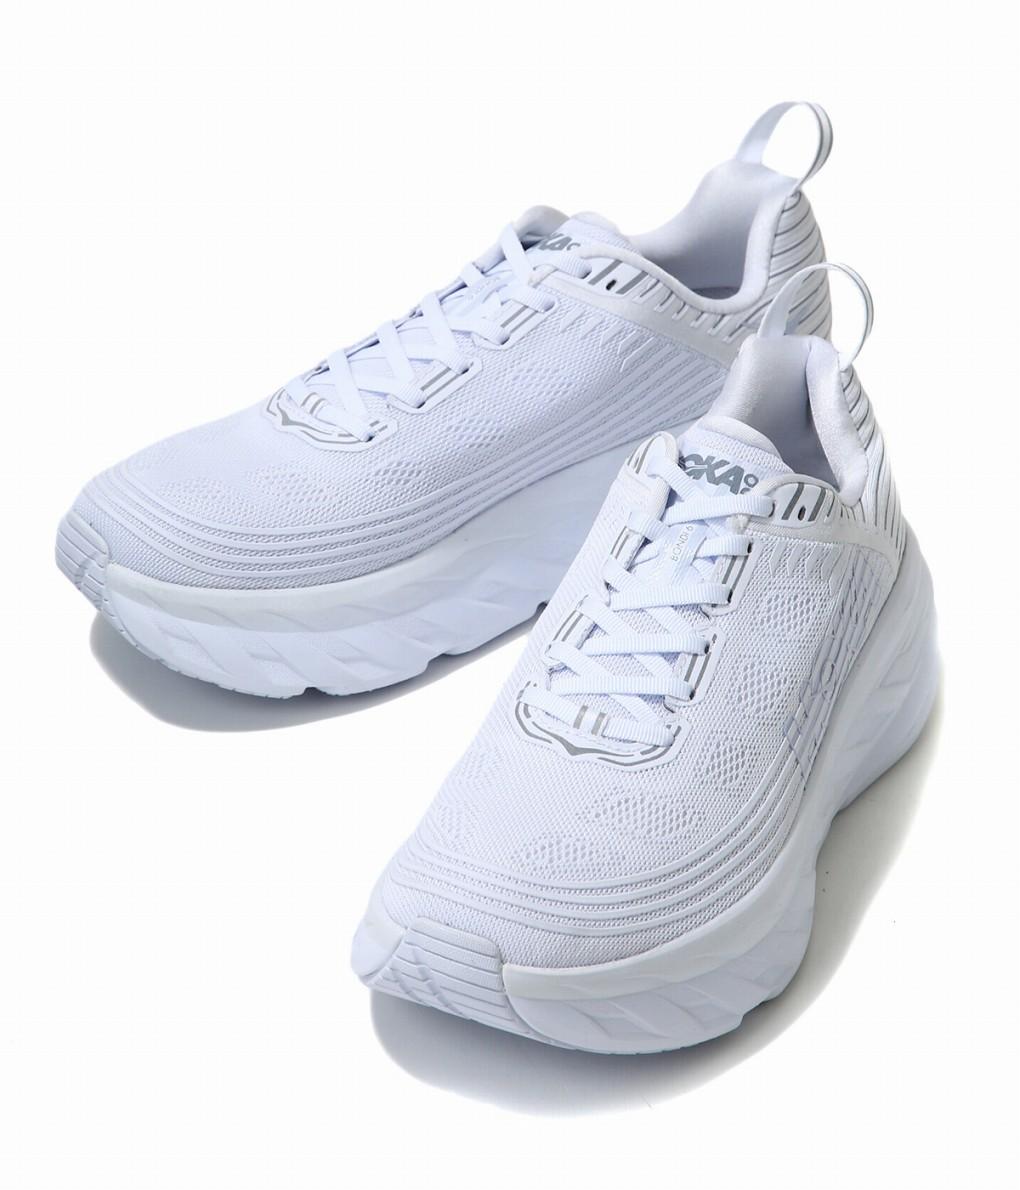 HOKA ONE ONE / ホカオネオネ : BONDI 6 -White Reflective- : ボンダイ6 ランニング スポーツ : 1019269-WWRF 【PIE】【REA】